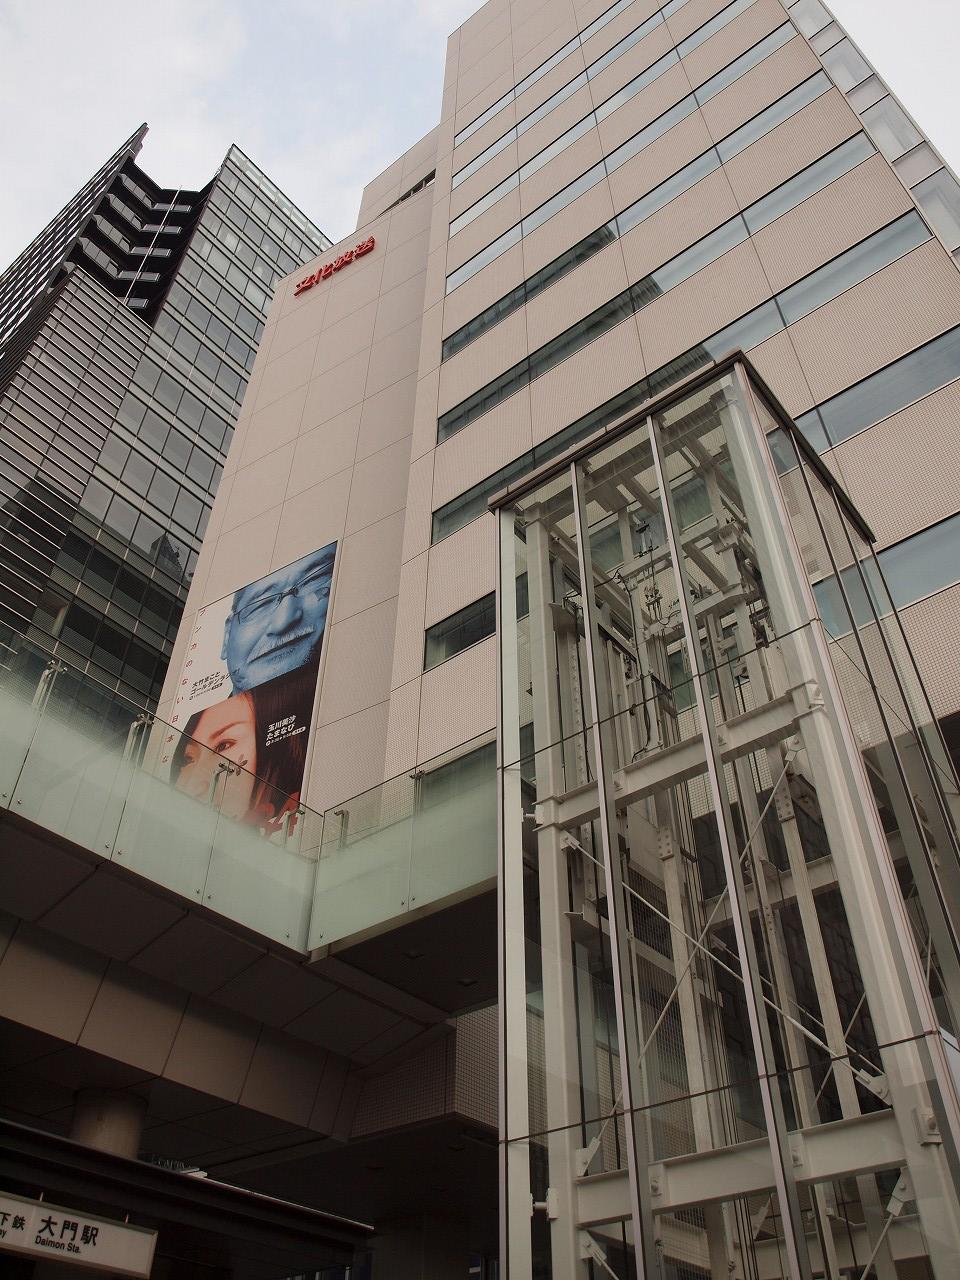 喜多村英梨の超ラジ! 公開生放送 文化放送